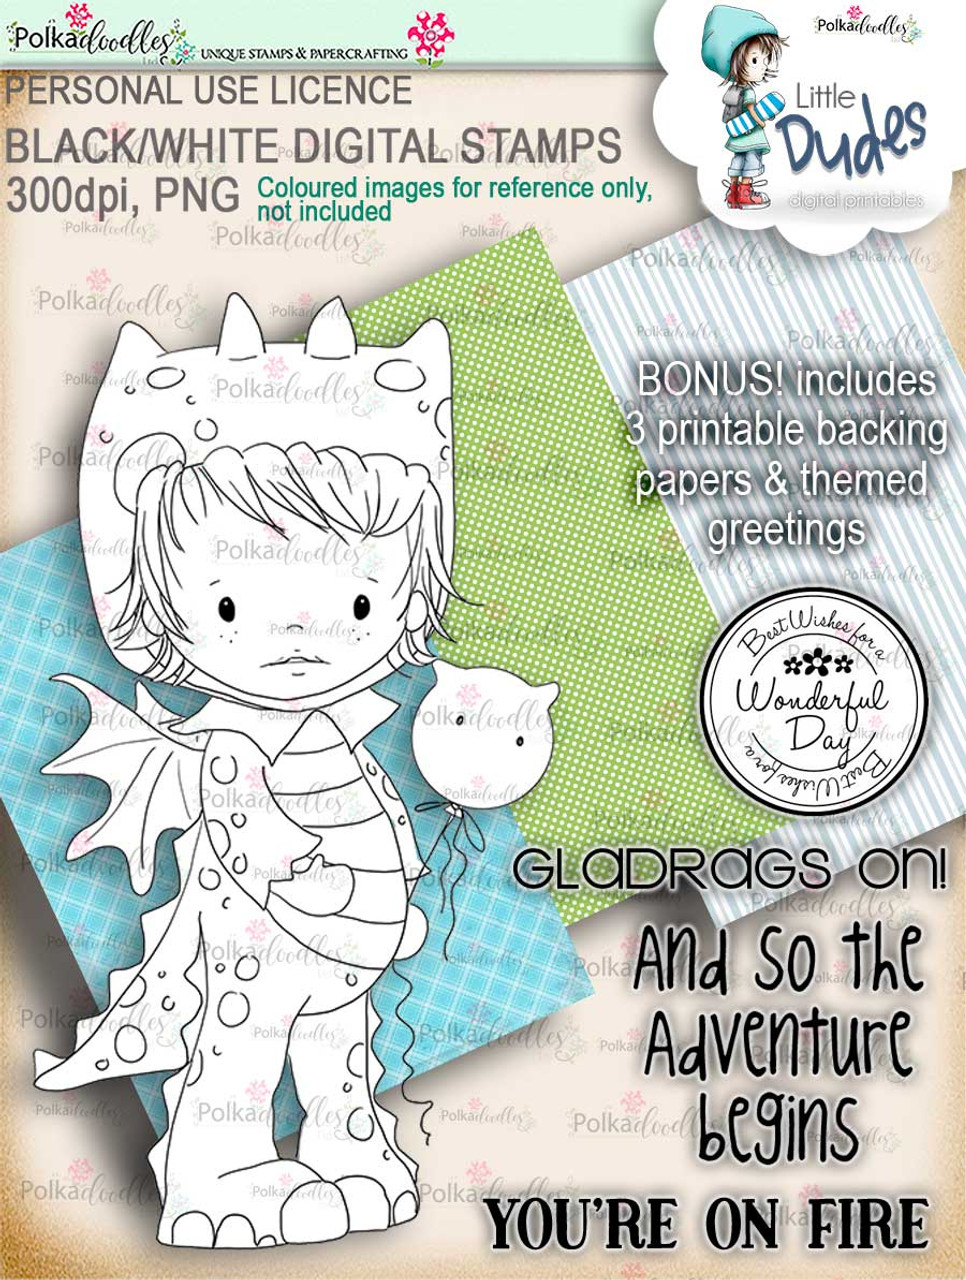 Polkadoodles Little Dudes Dragon Onesie Digital Stamp